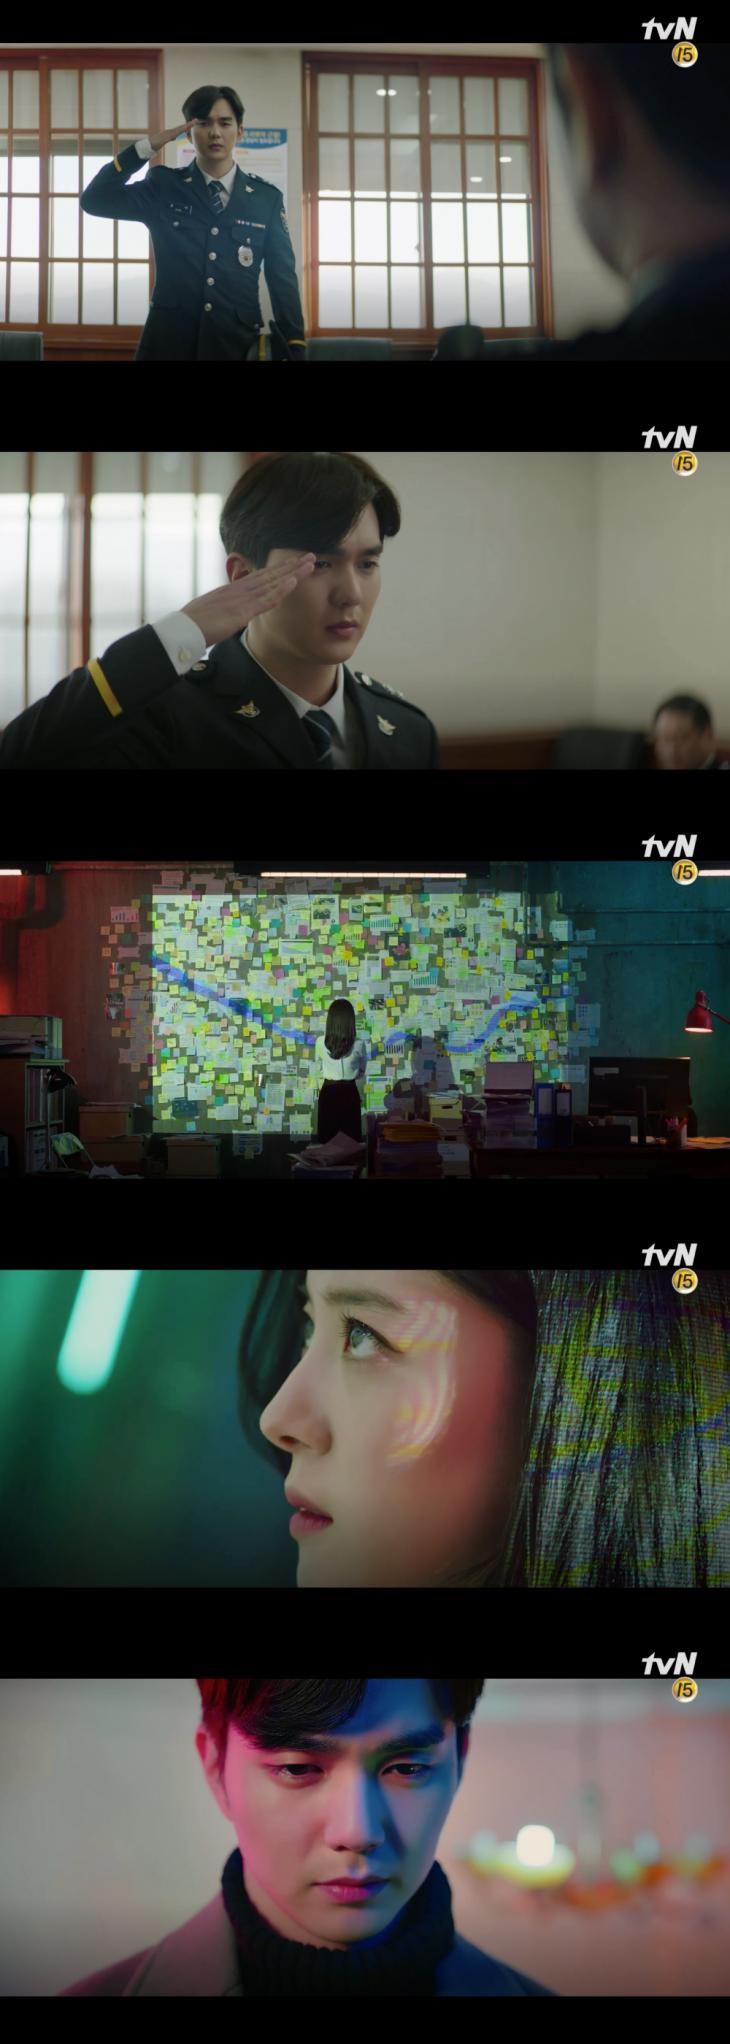 tvN '메모리스트' 티저 캡처